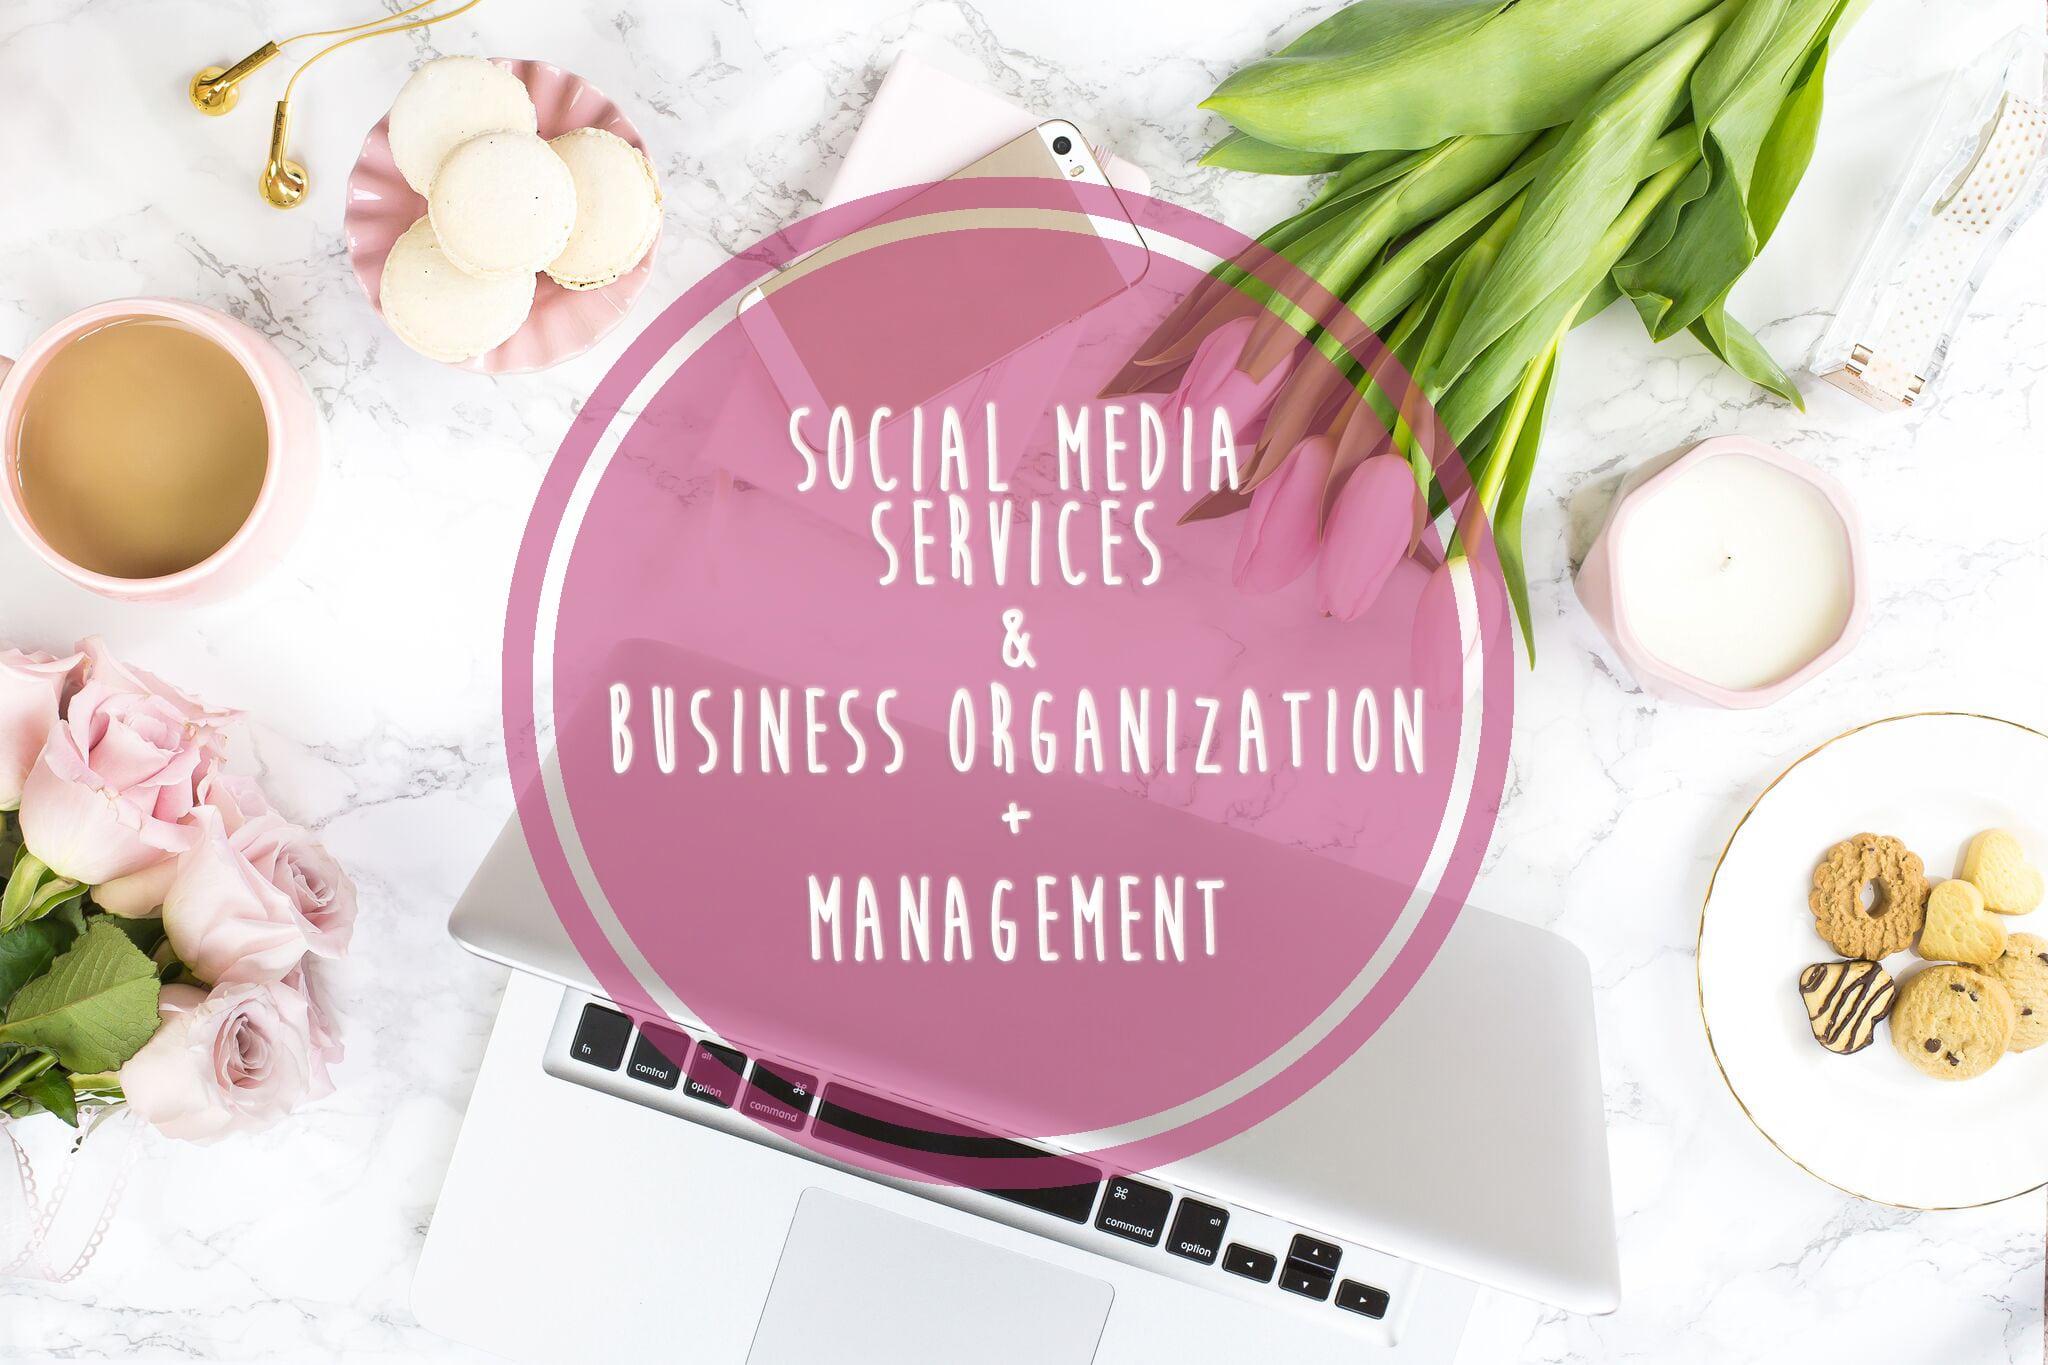 SOCIAL MEDIA SERVICES BUSINESS ORGANIATION MANAGEMENT VIRTUAL ASSISTANCE